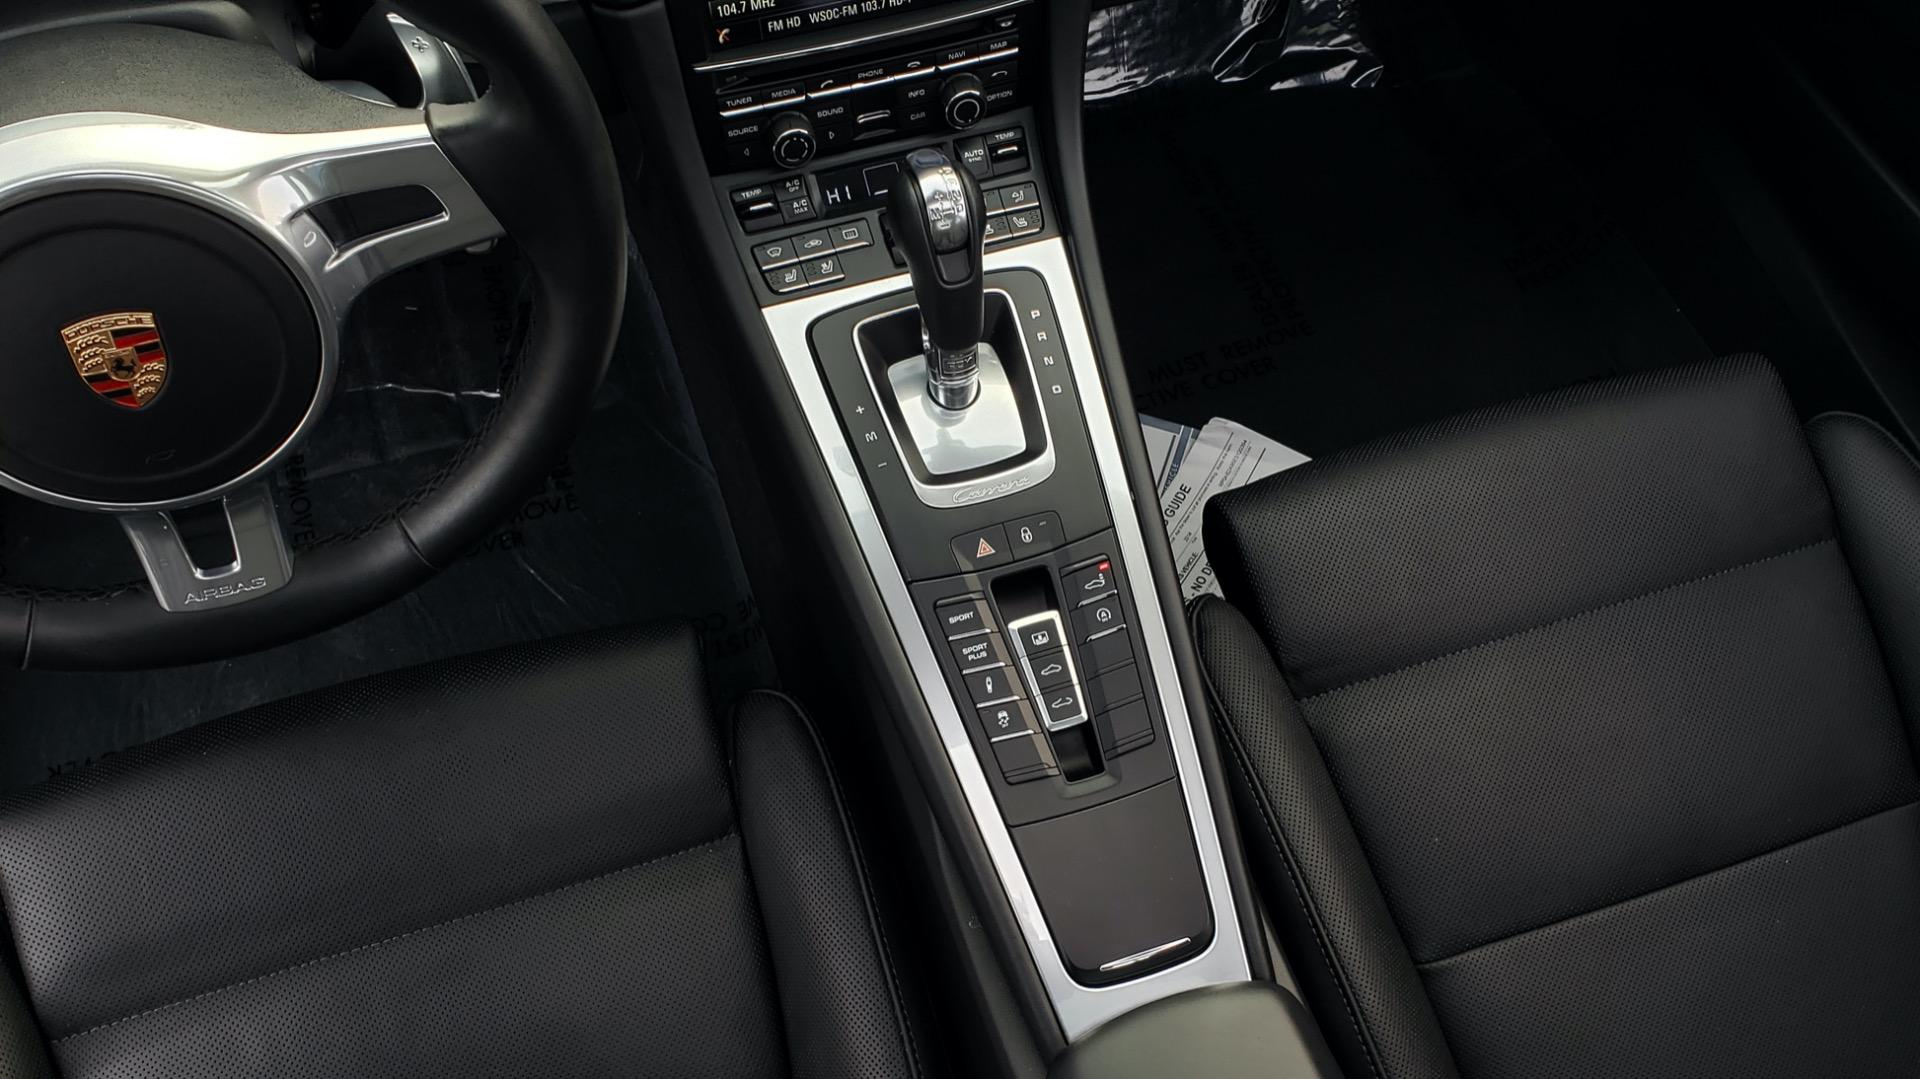 Used 2014 Porsche 911 CARRERA 4S / PREM PKG PLUS / NAV / SUNROO / BOSE / CHRONO for sale Sold at Formula Imports in Charlotte NC 28227 38